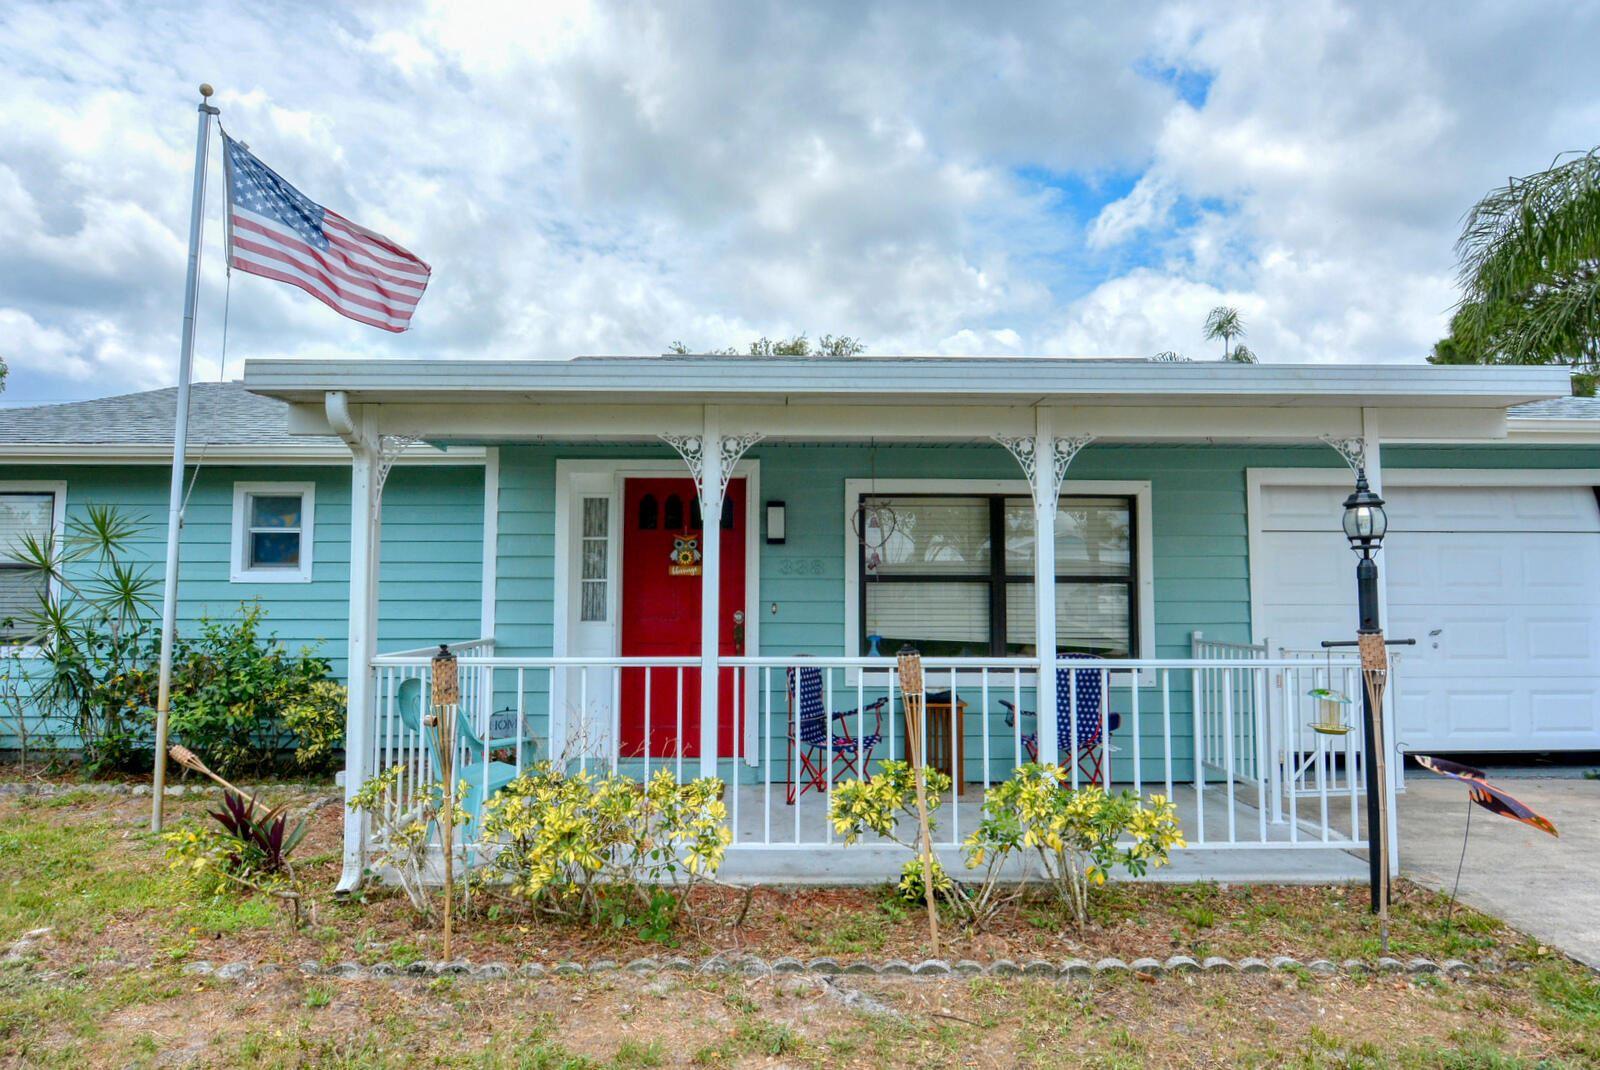 338 NE Greenbrier Avenue, Port Saint Lucie, FL 34983 - MLS#: RX-10715530